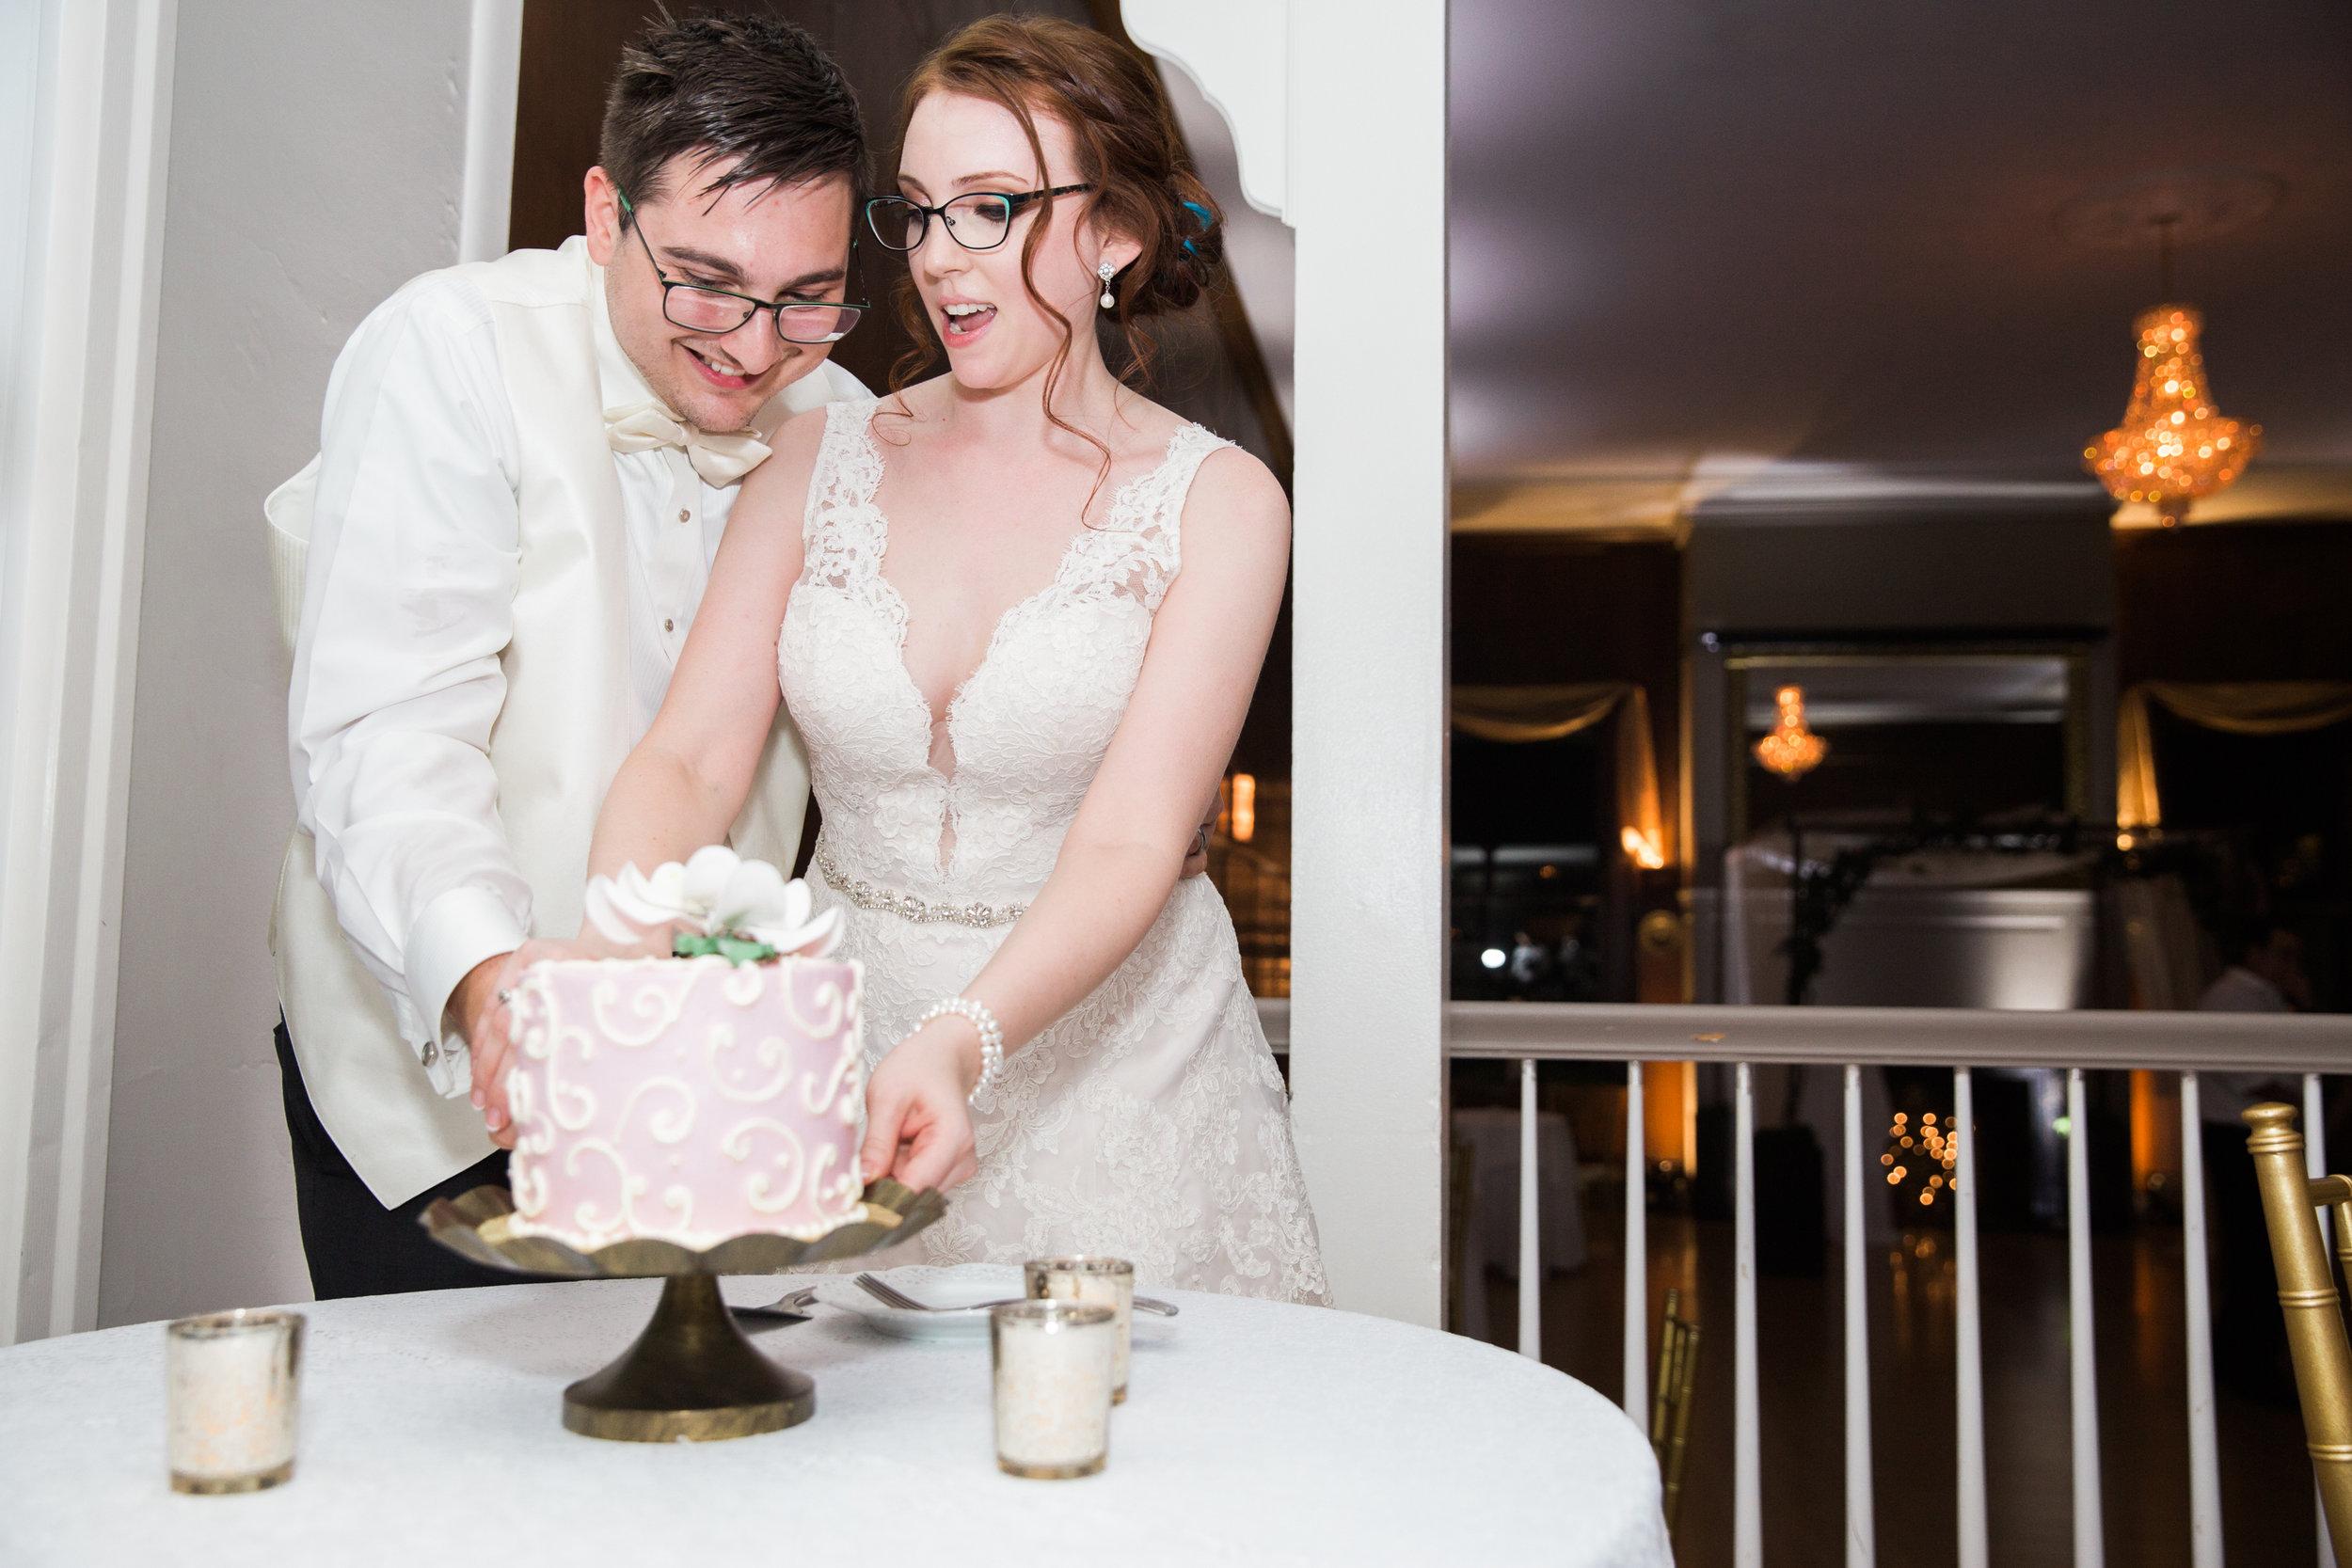 Harry Potter Wedding at Overhills Mansion Catonville Maryland Wedding Photographers Megapixels Media (111 of 134).jpg